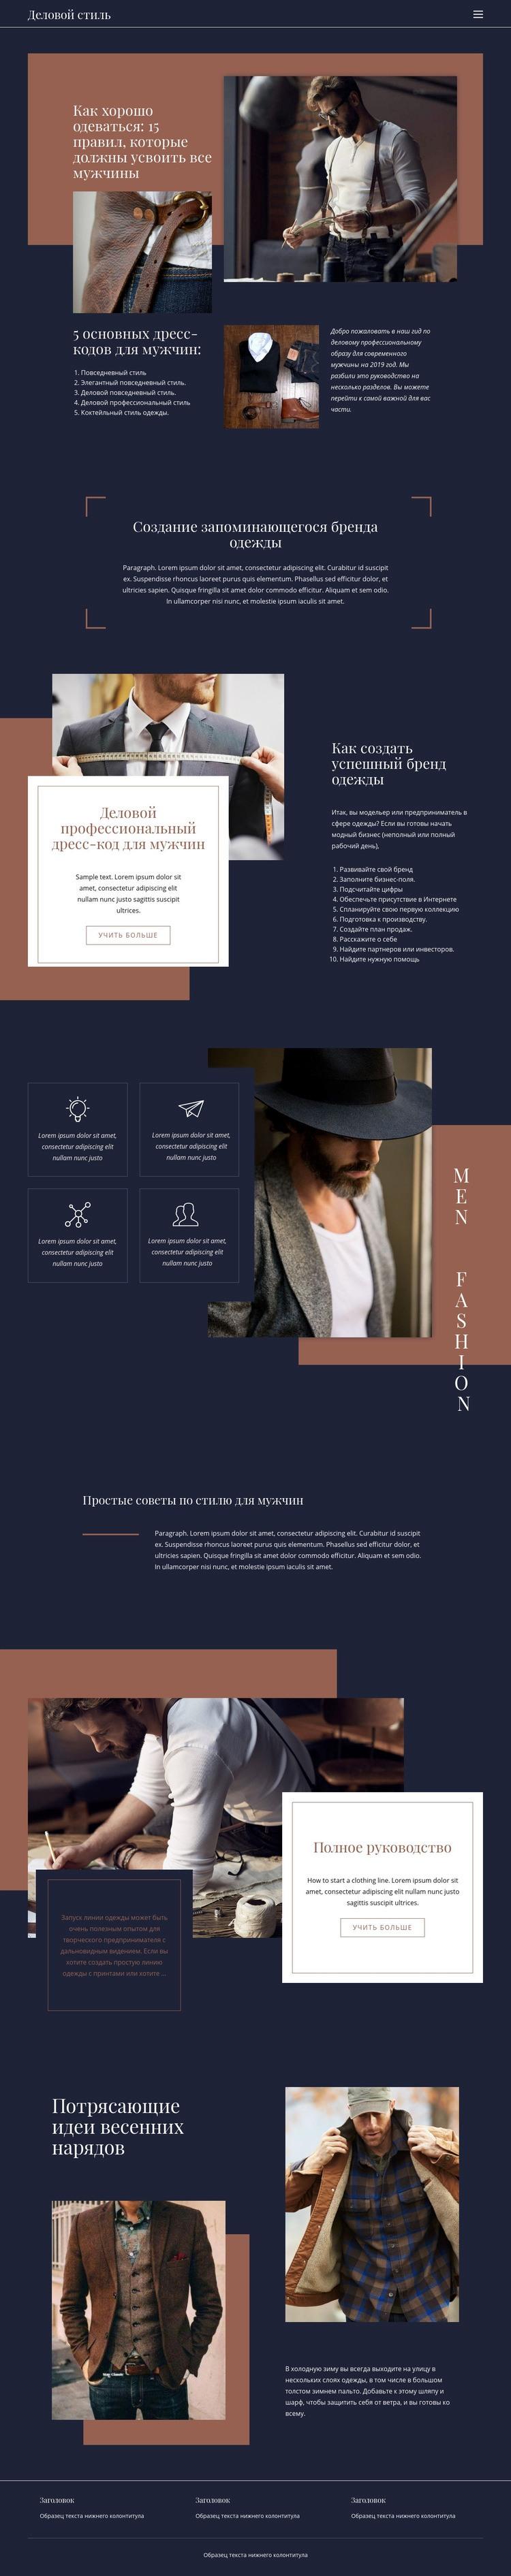 Правила победы моды Шаблон веб-сайта